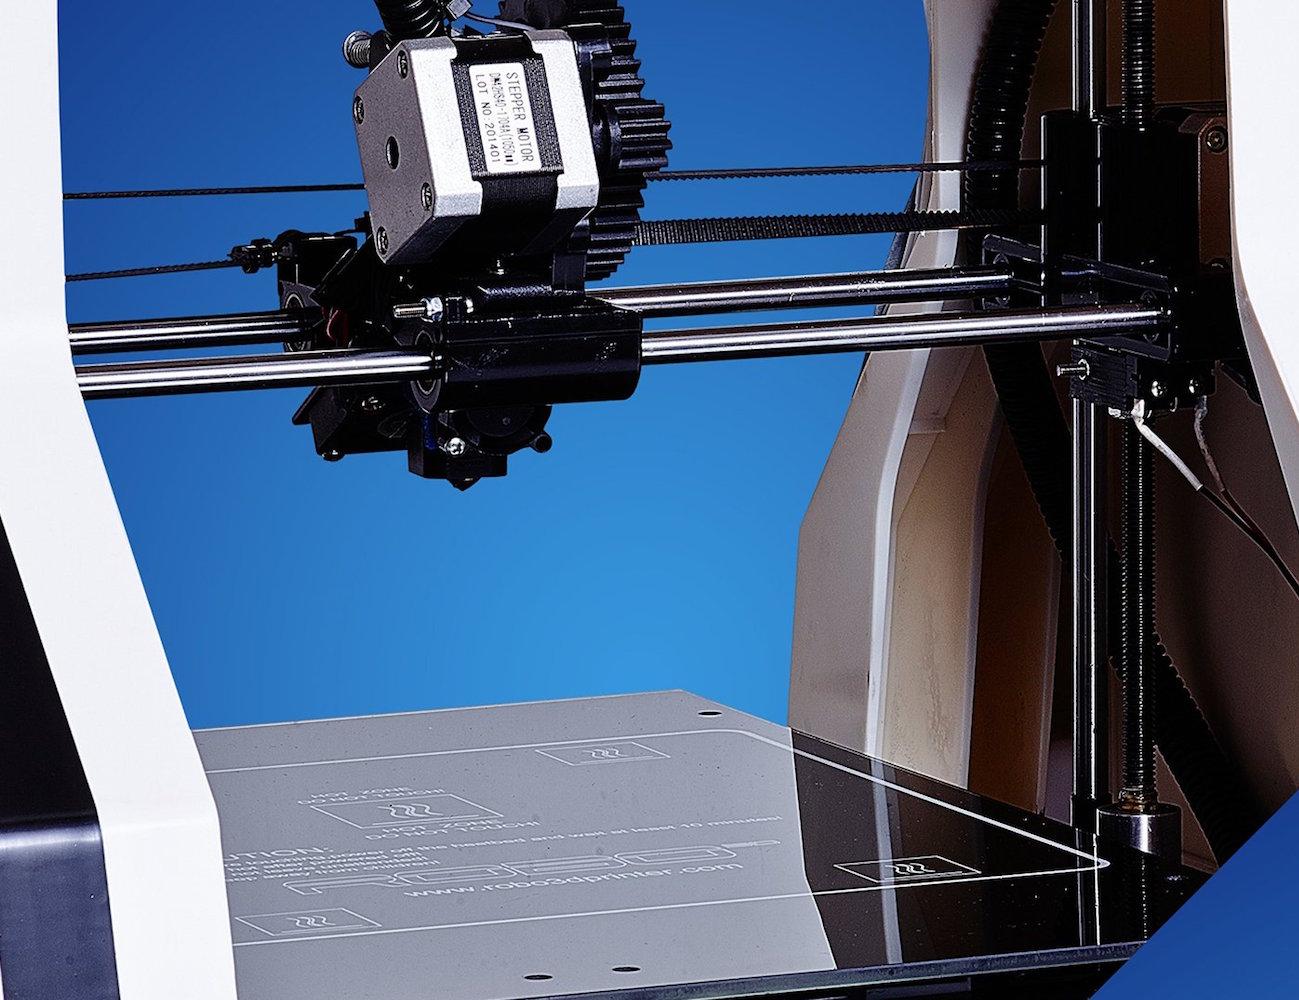 ROBO 3D R1 Plus Fully Assembled 3D Printer